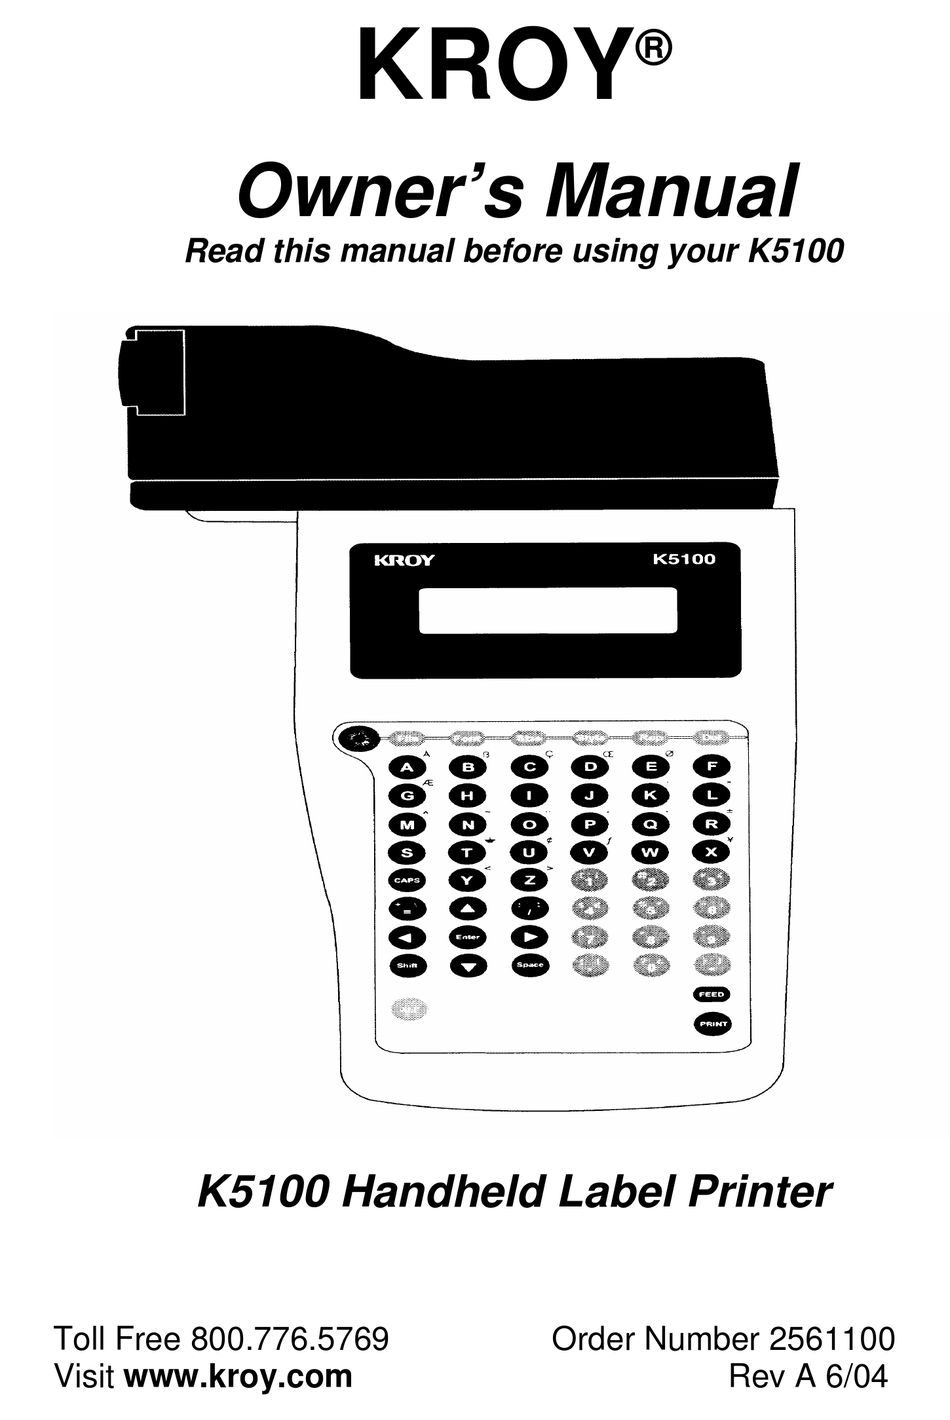 Download Kroy Printers Driver